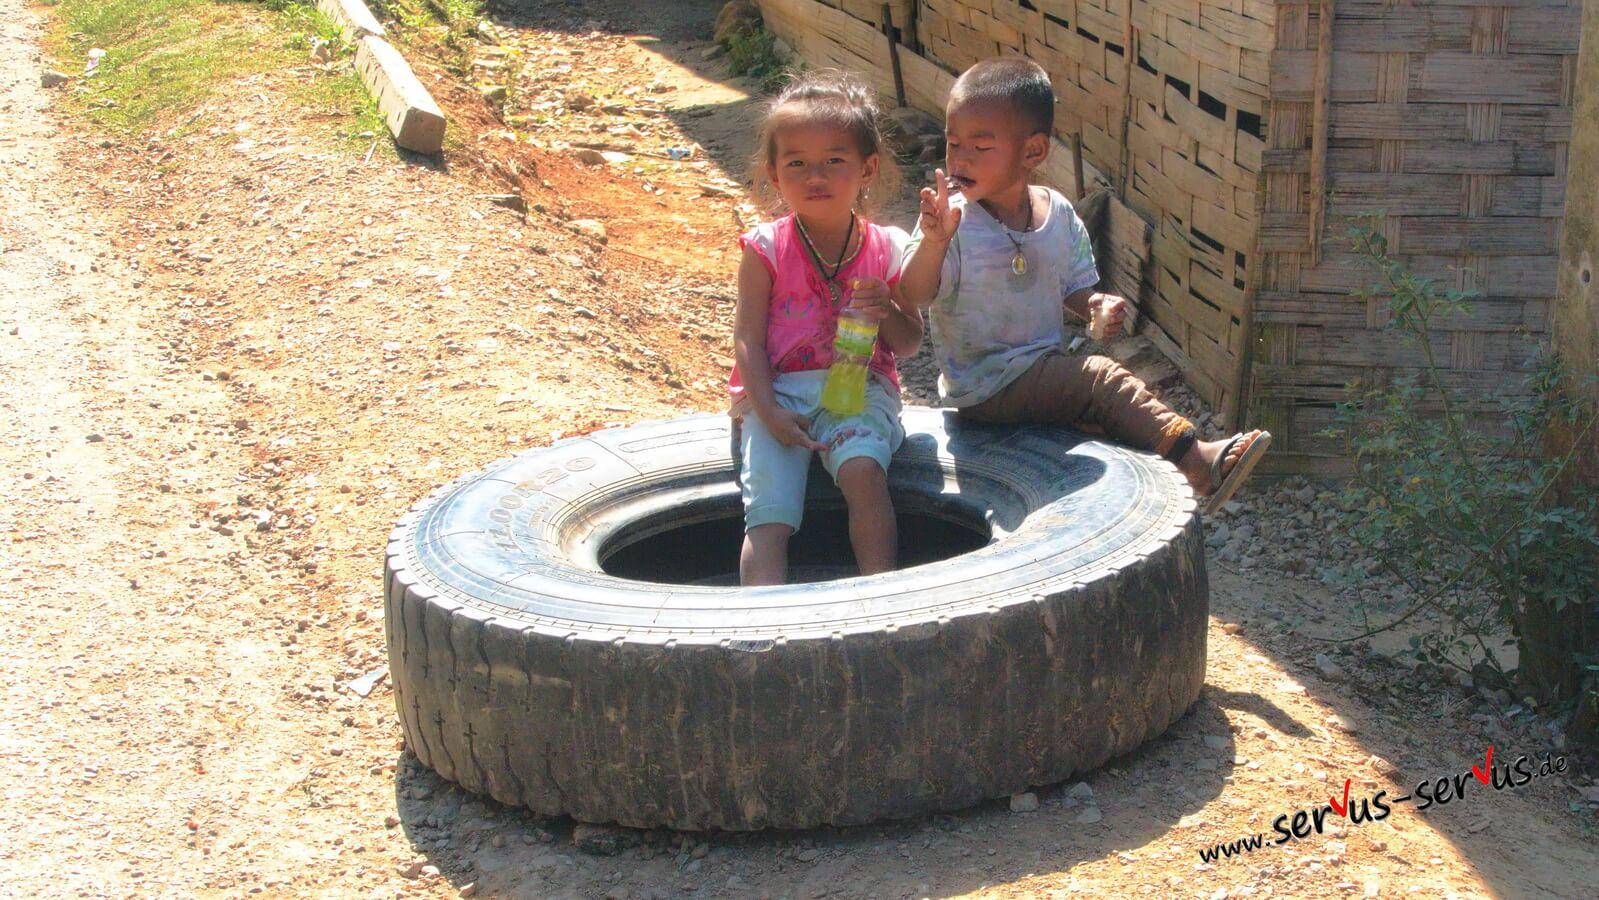 Laos-Kinder-im-Reifen